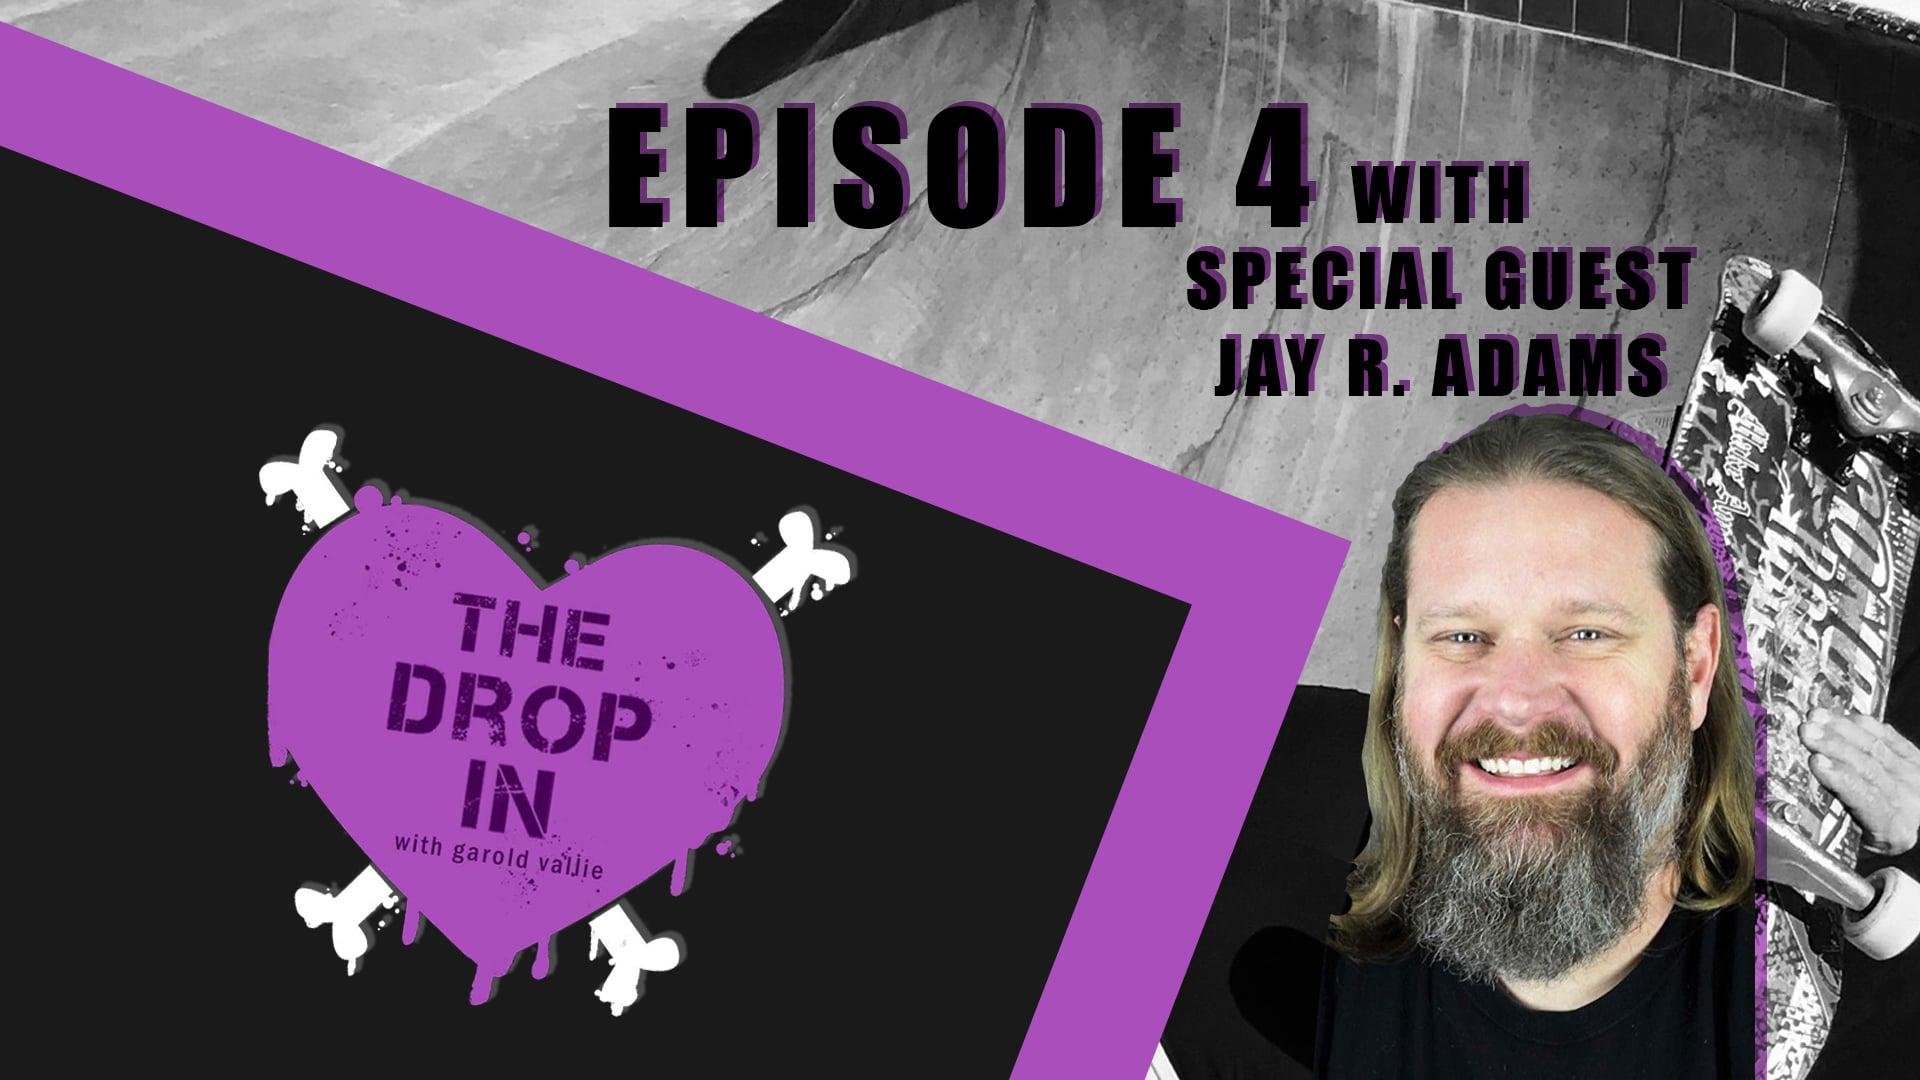 The Drop In with Garold Vallie - Episode 4